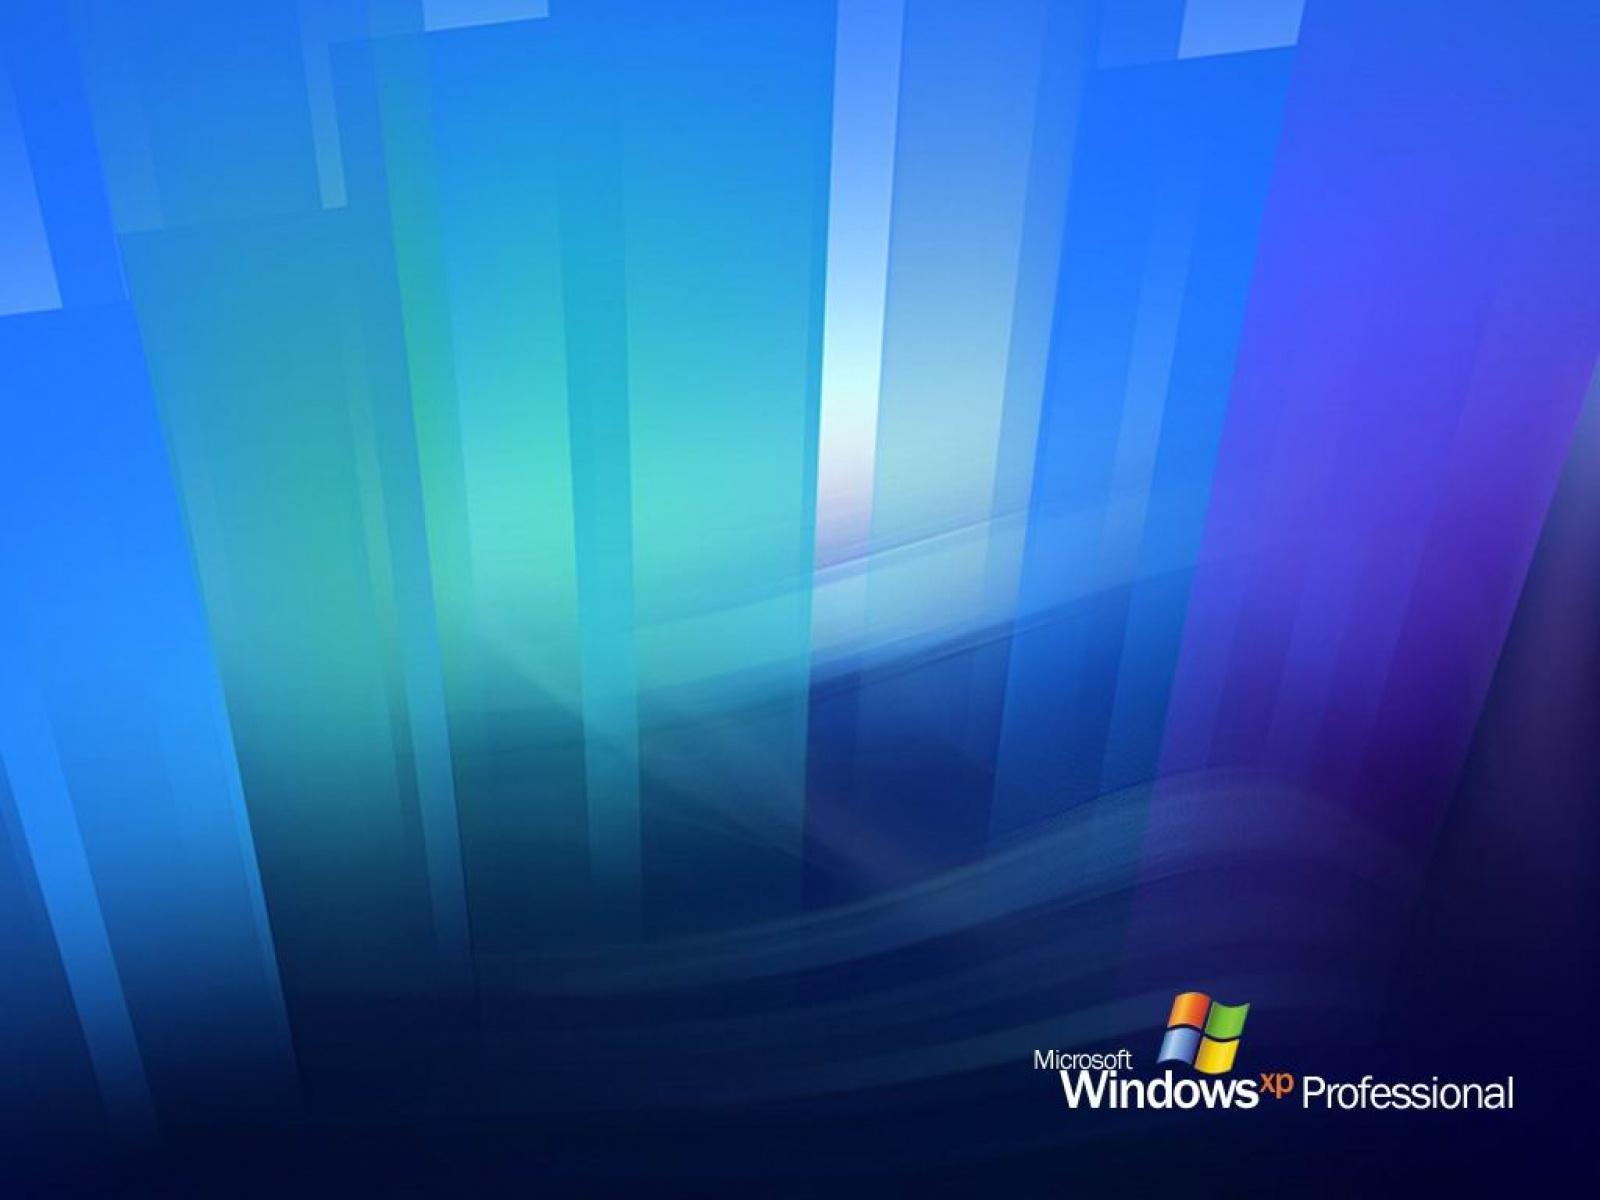 windows xp professional wallpapers 7833 1600x1200